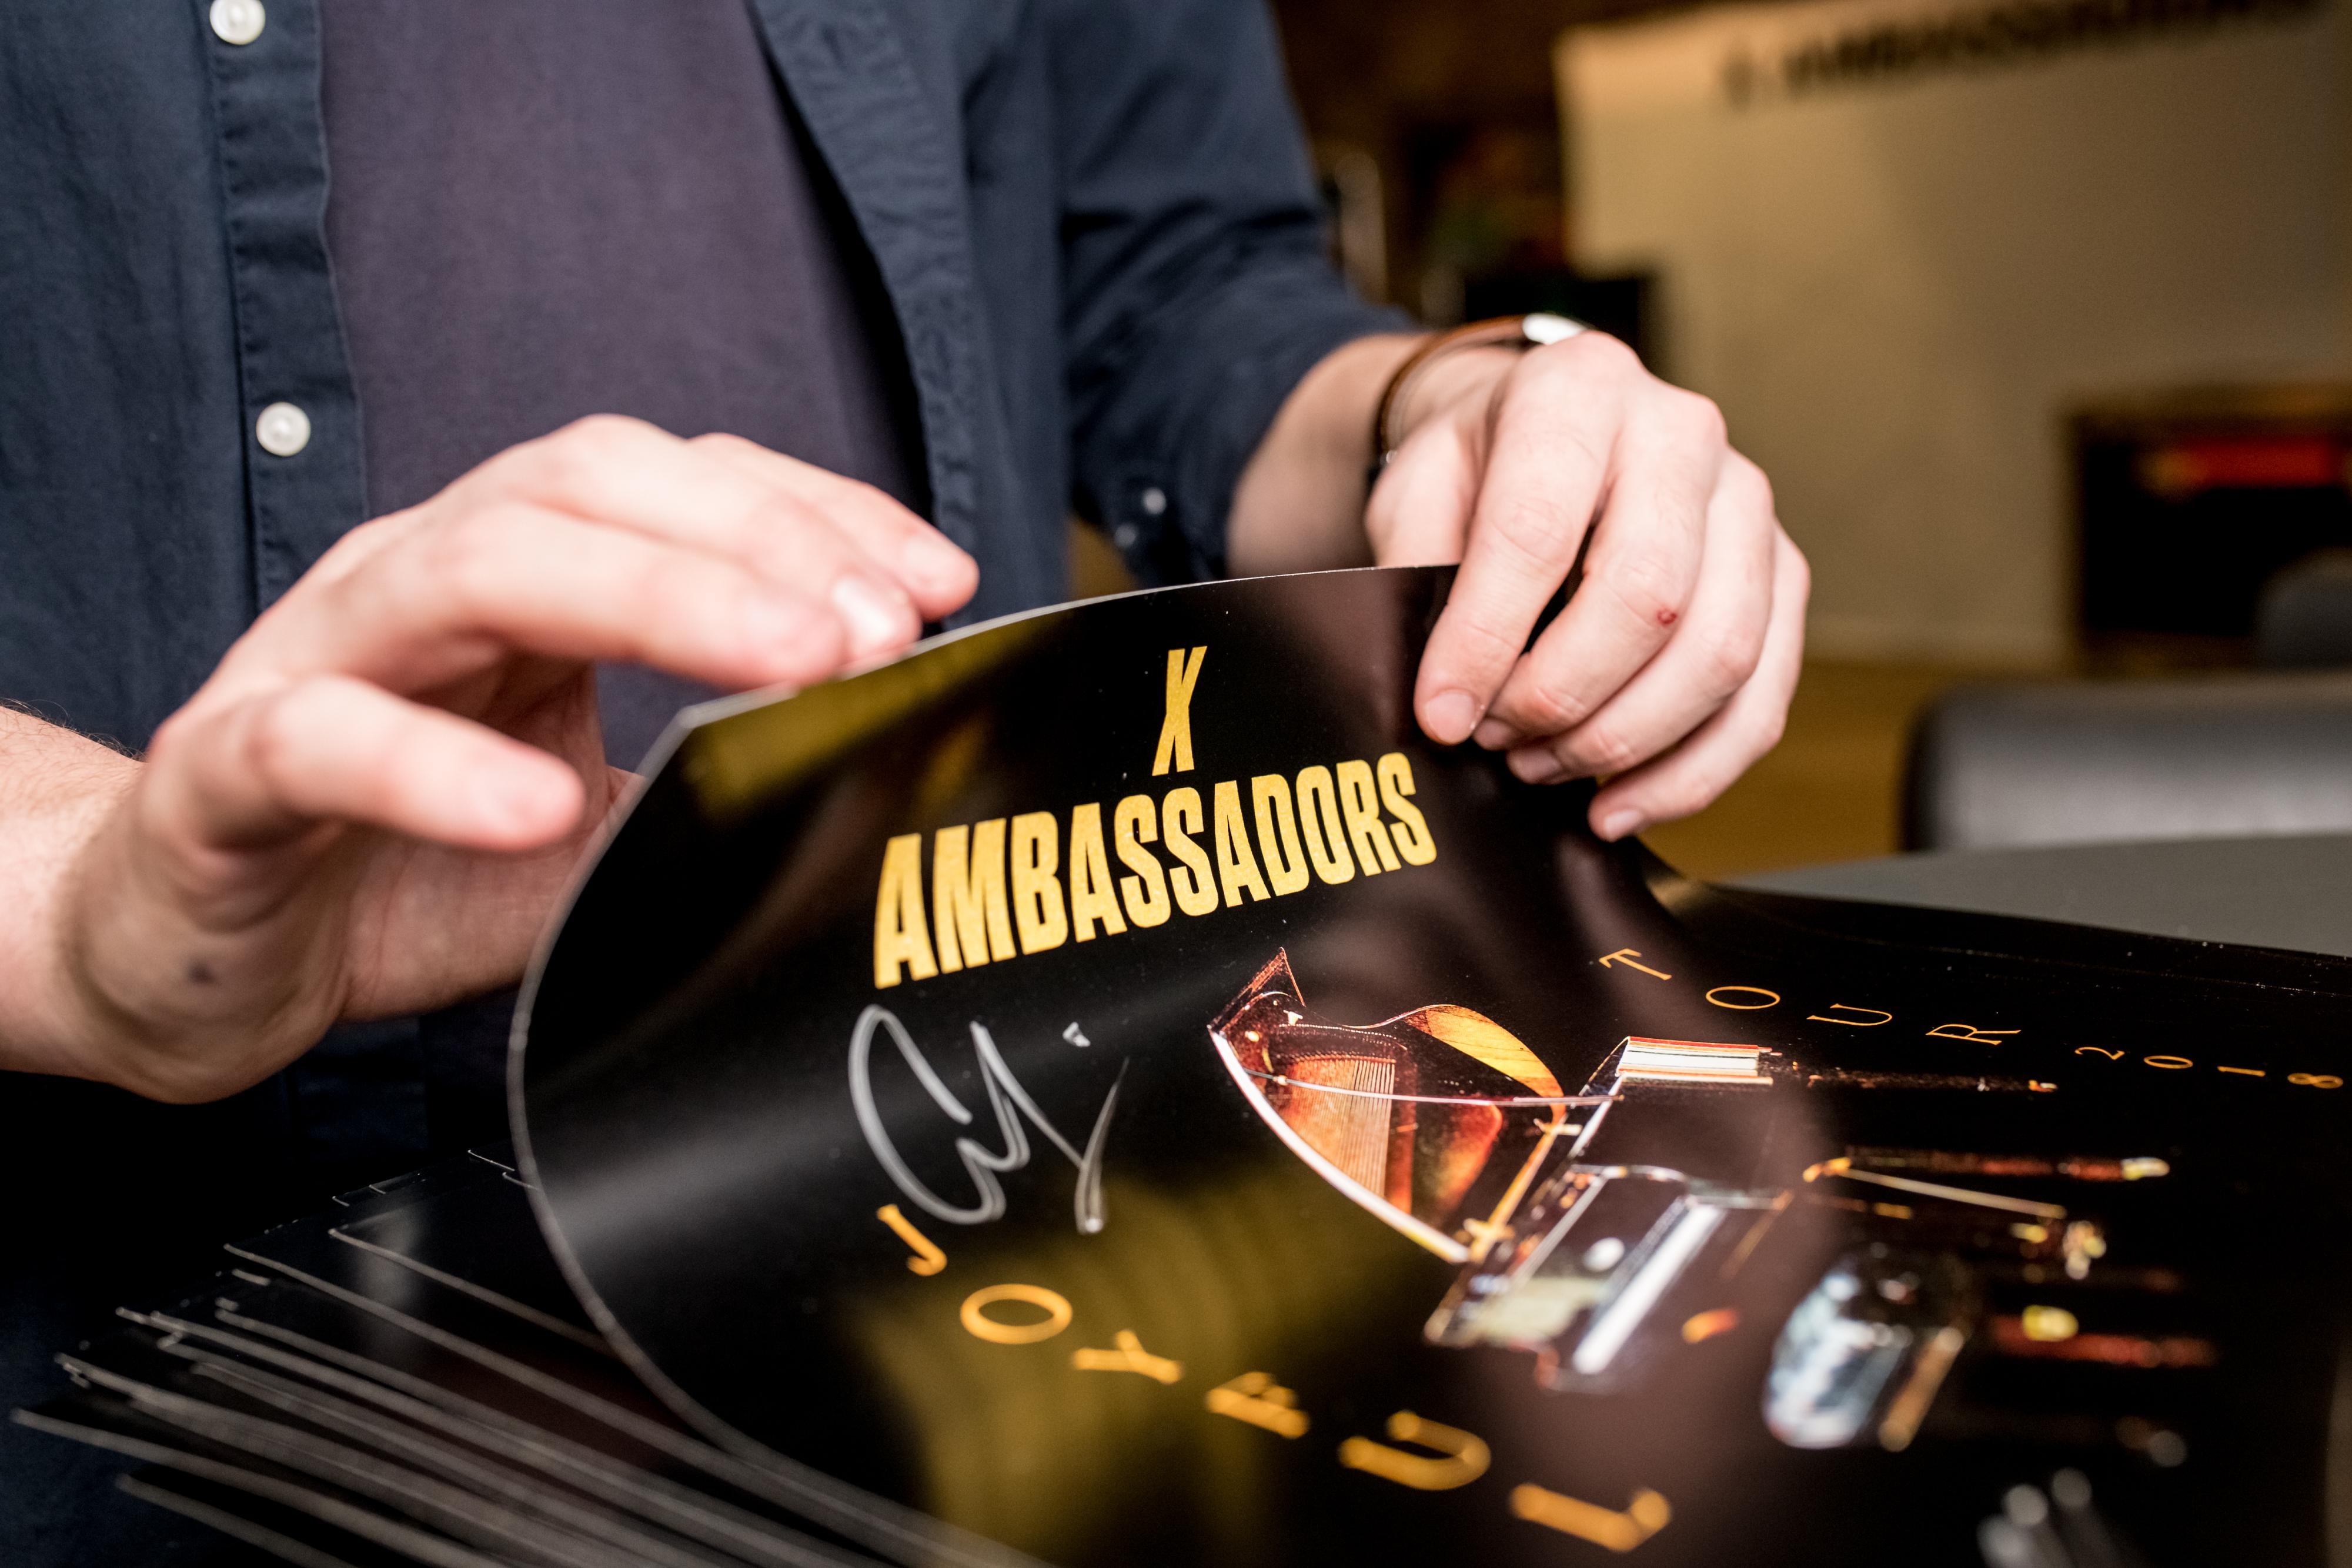 X Ambassadors VIP Ticket Packages - The Joyful Tour 2018